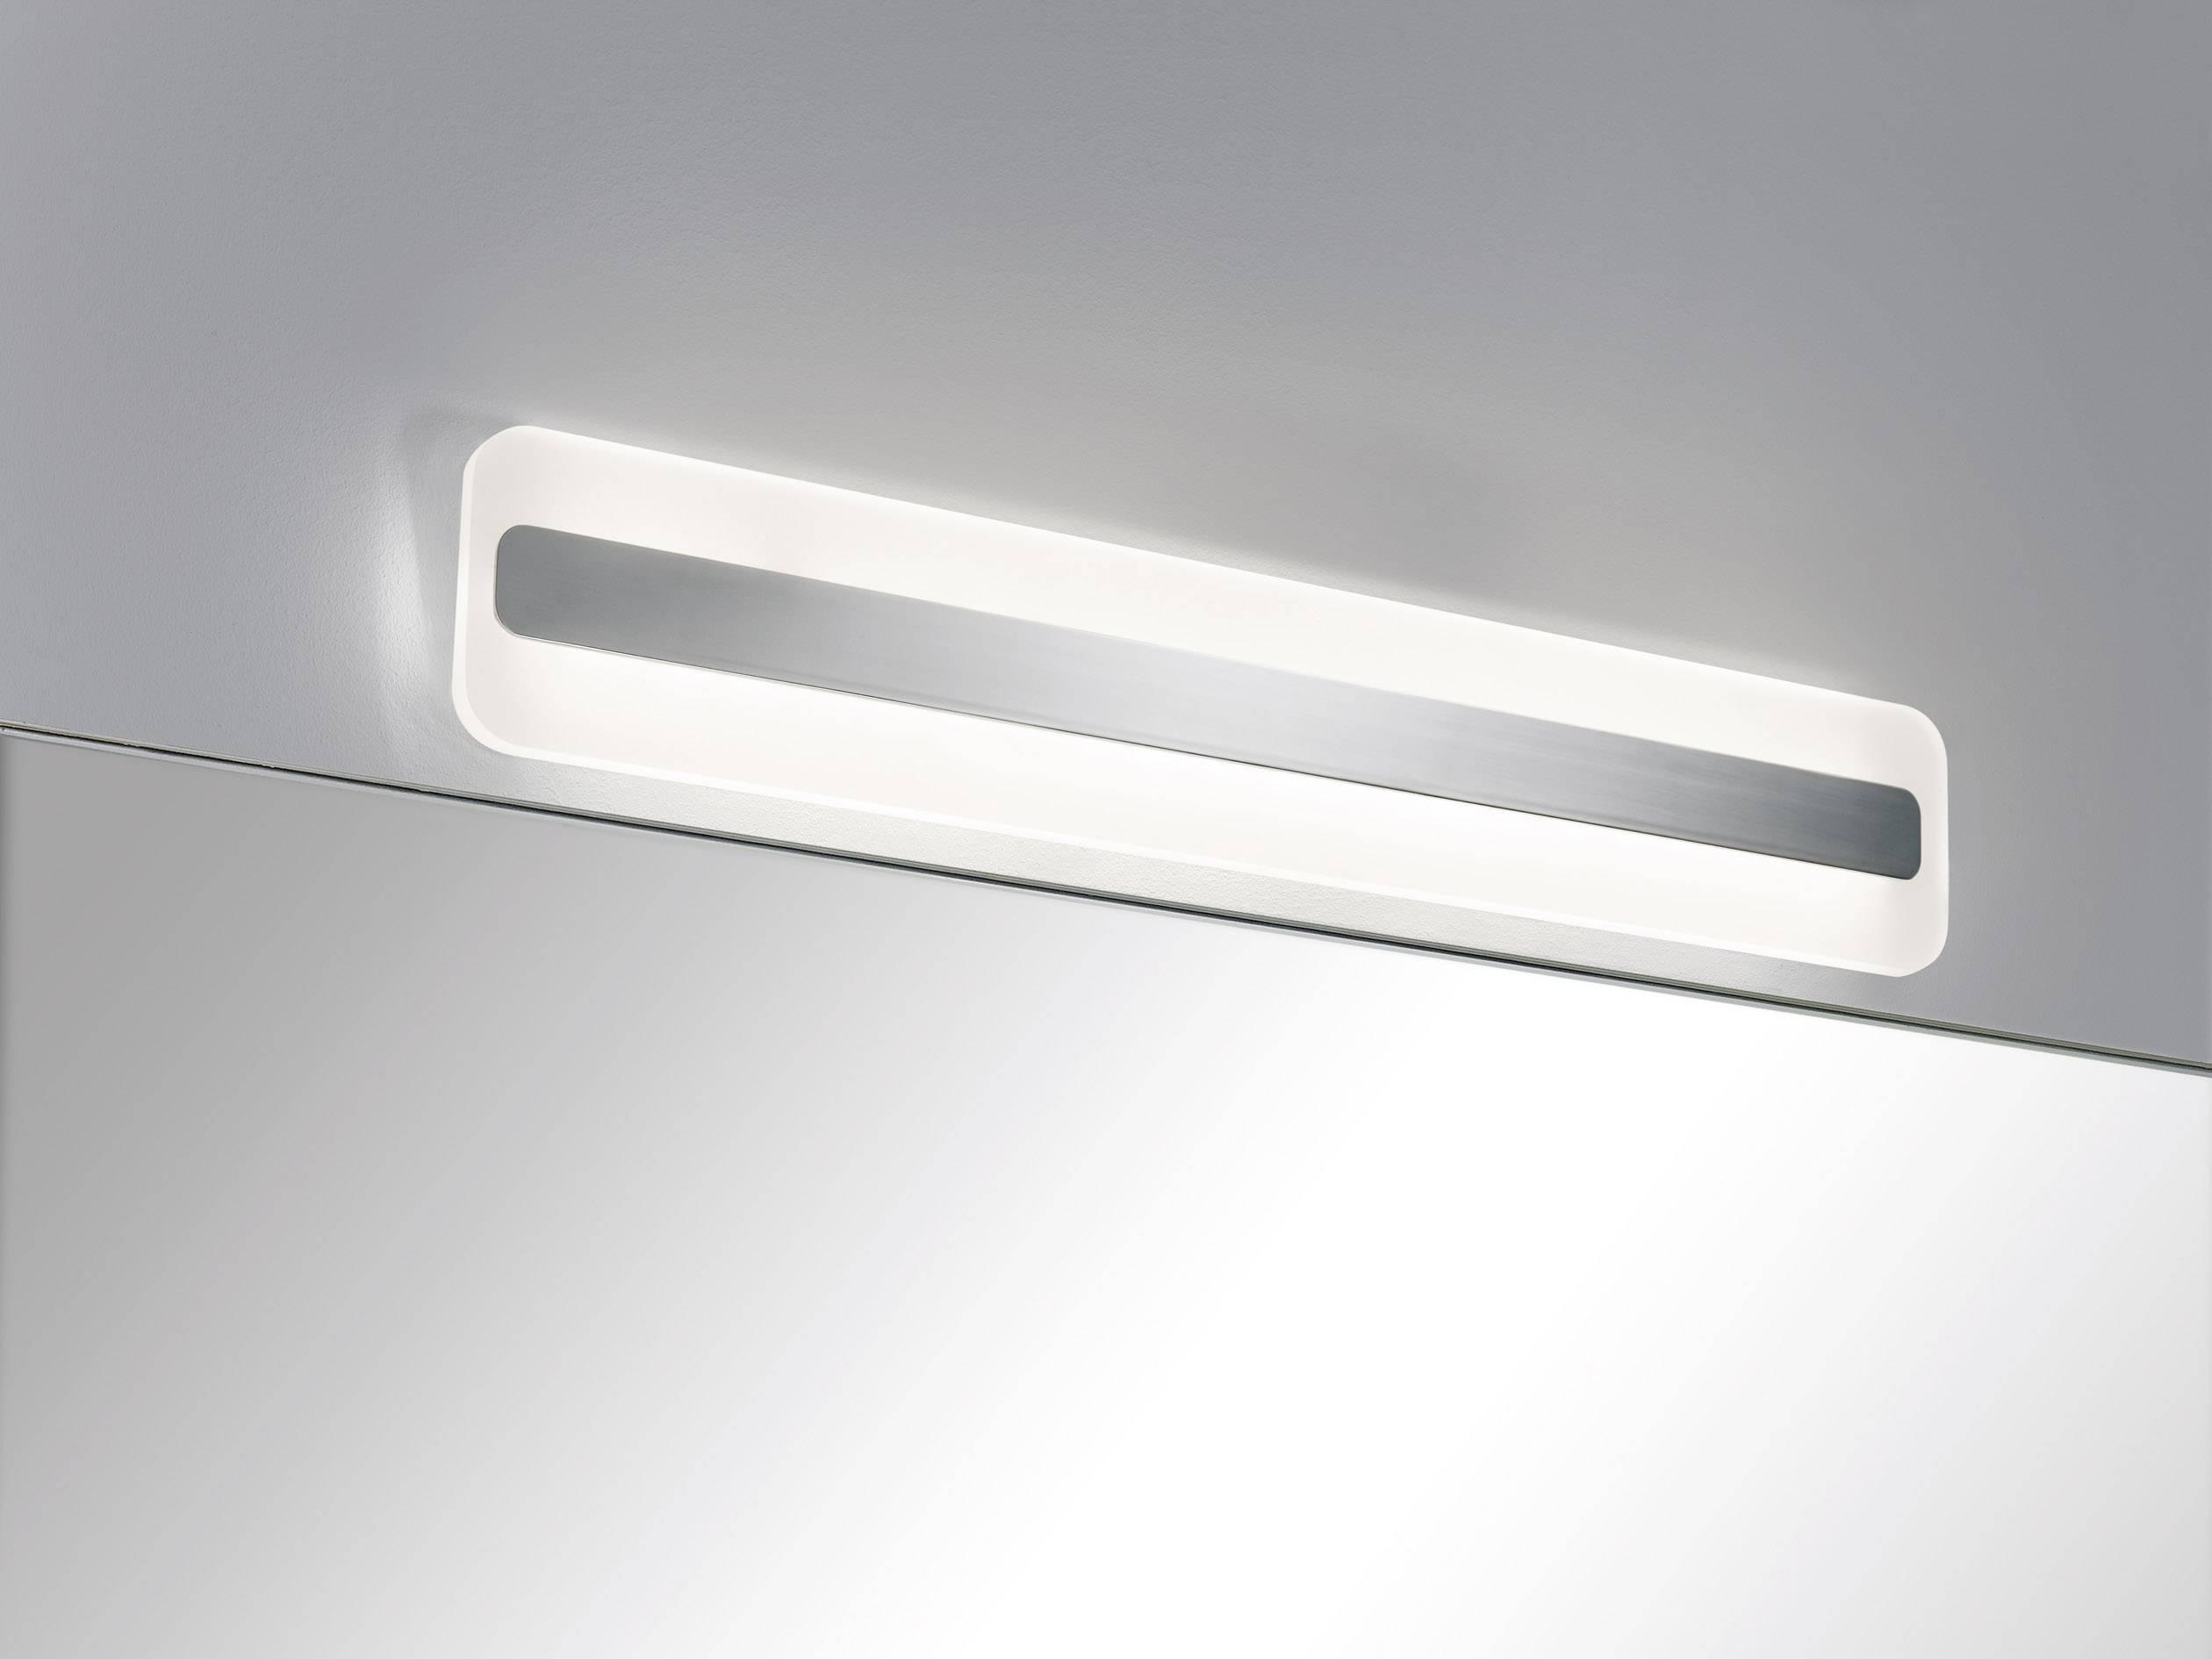 LED-badkamer wandlamp 9 W Warm-wit Paulmann 70463 Lukida Chroom ...